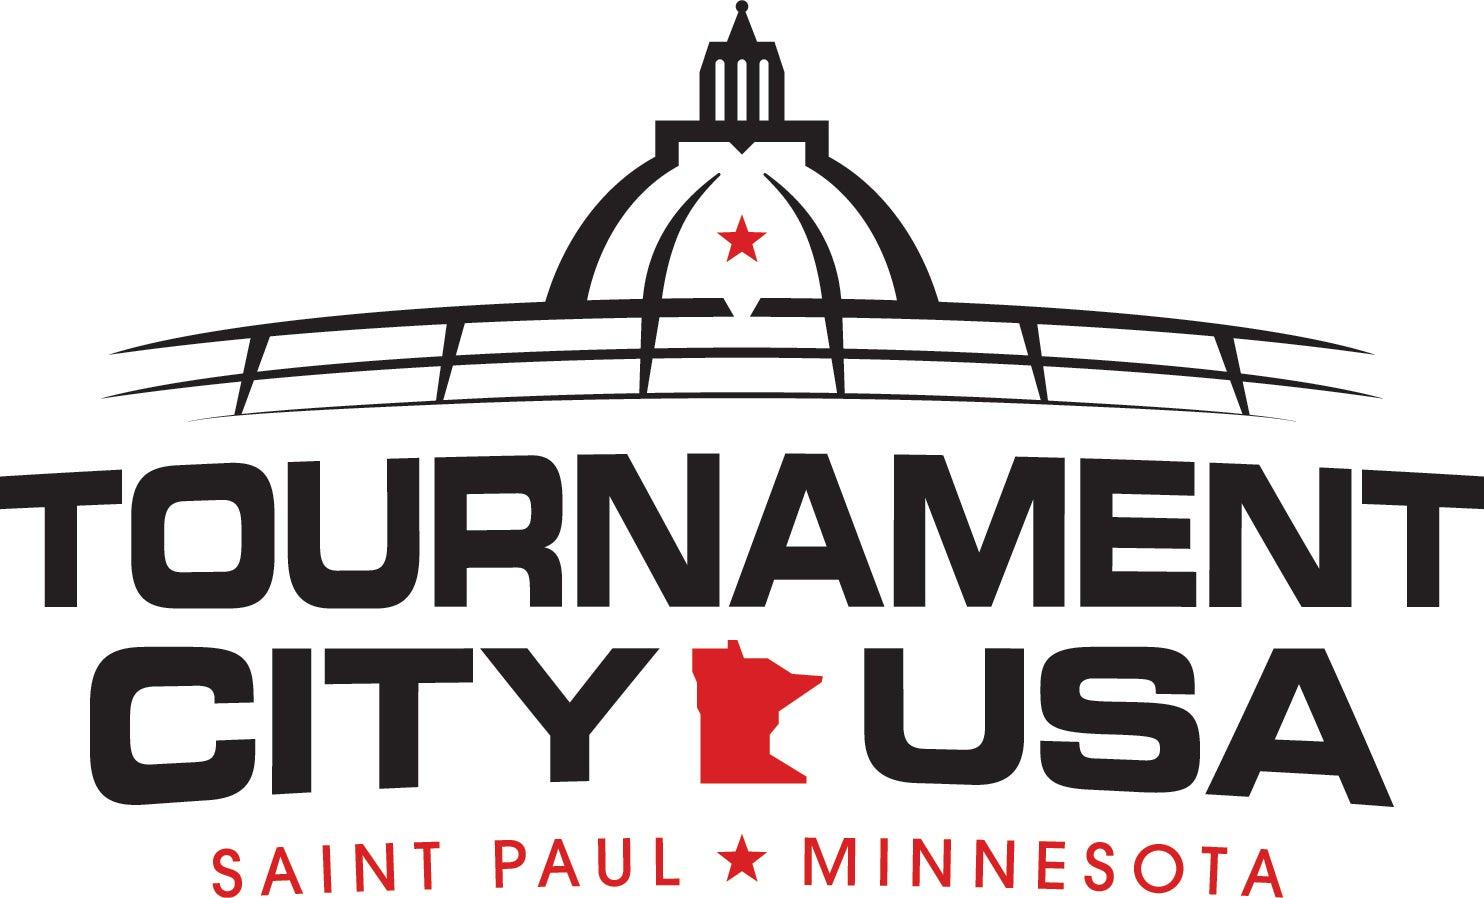 It's Tournament Time in Saint Paul